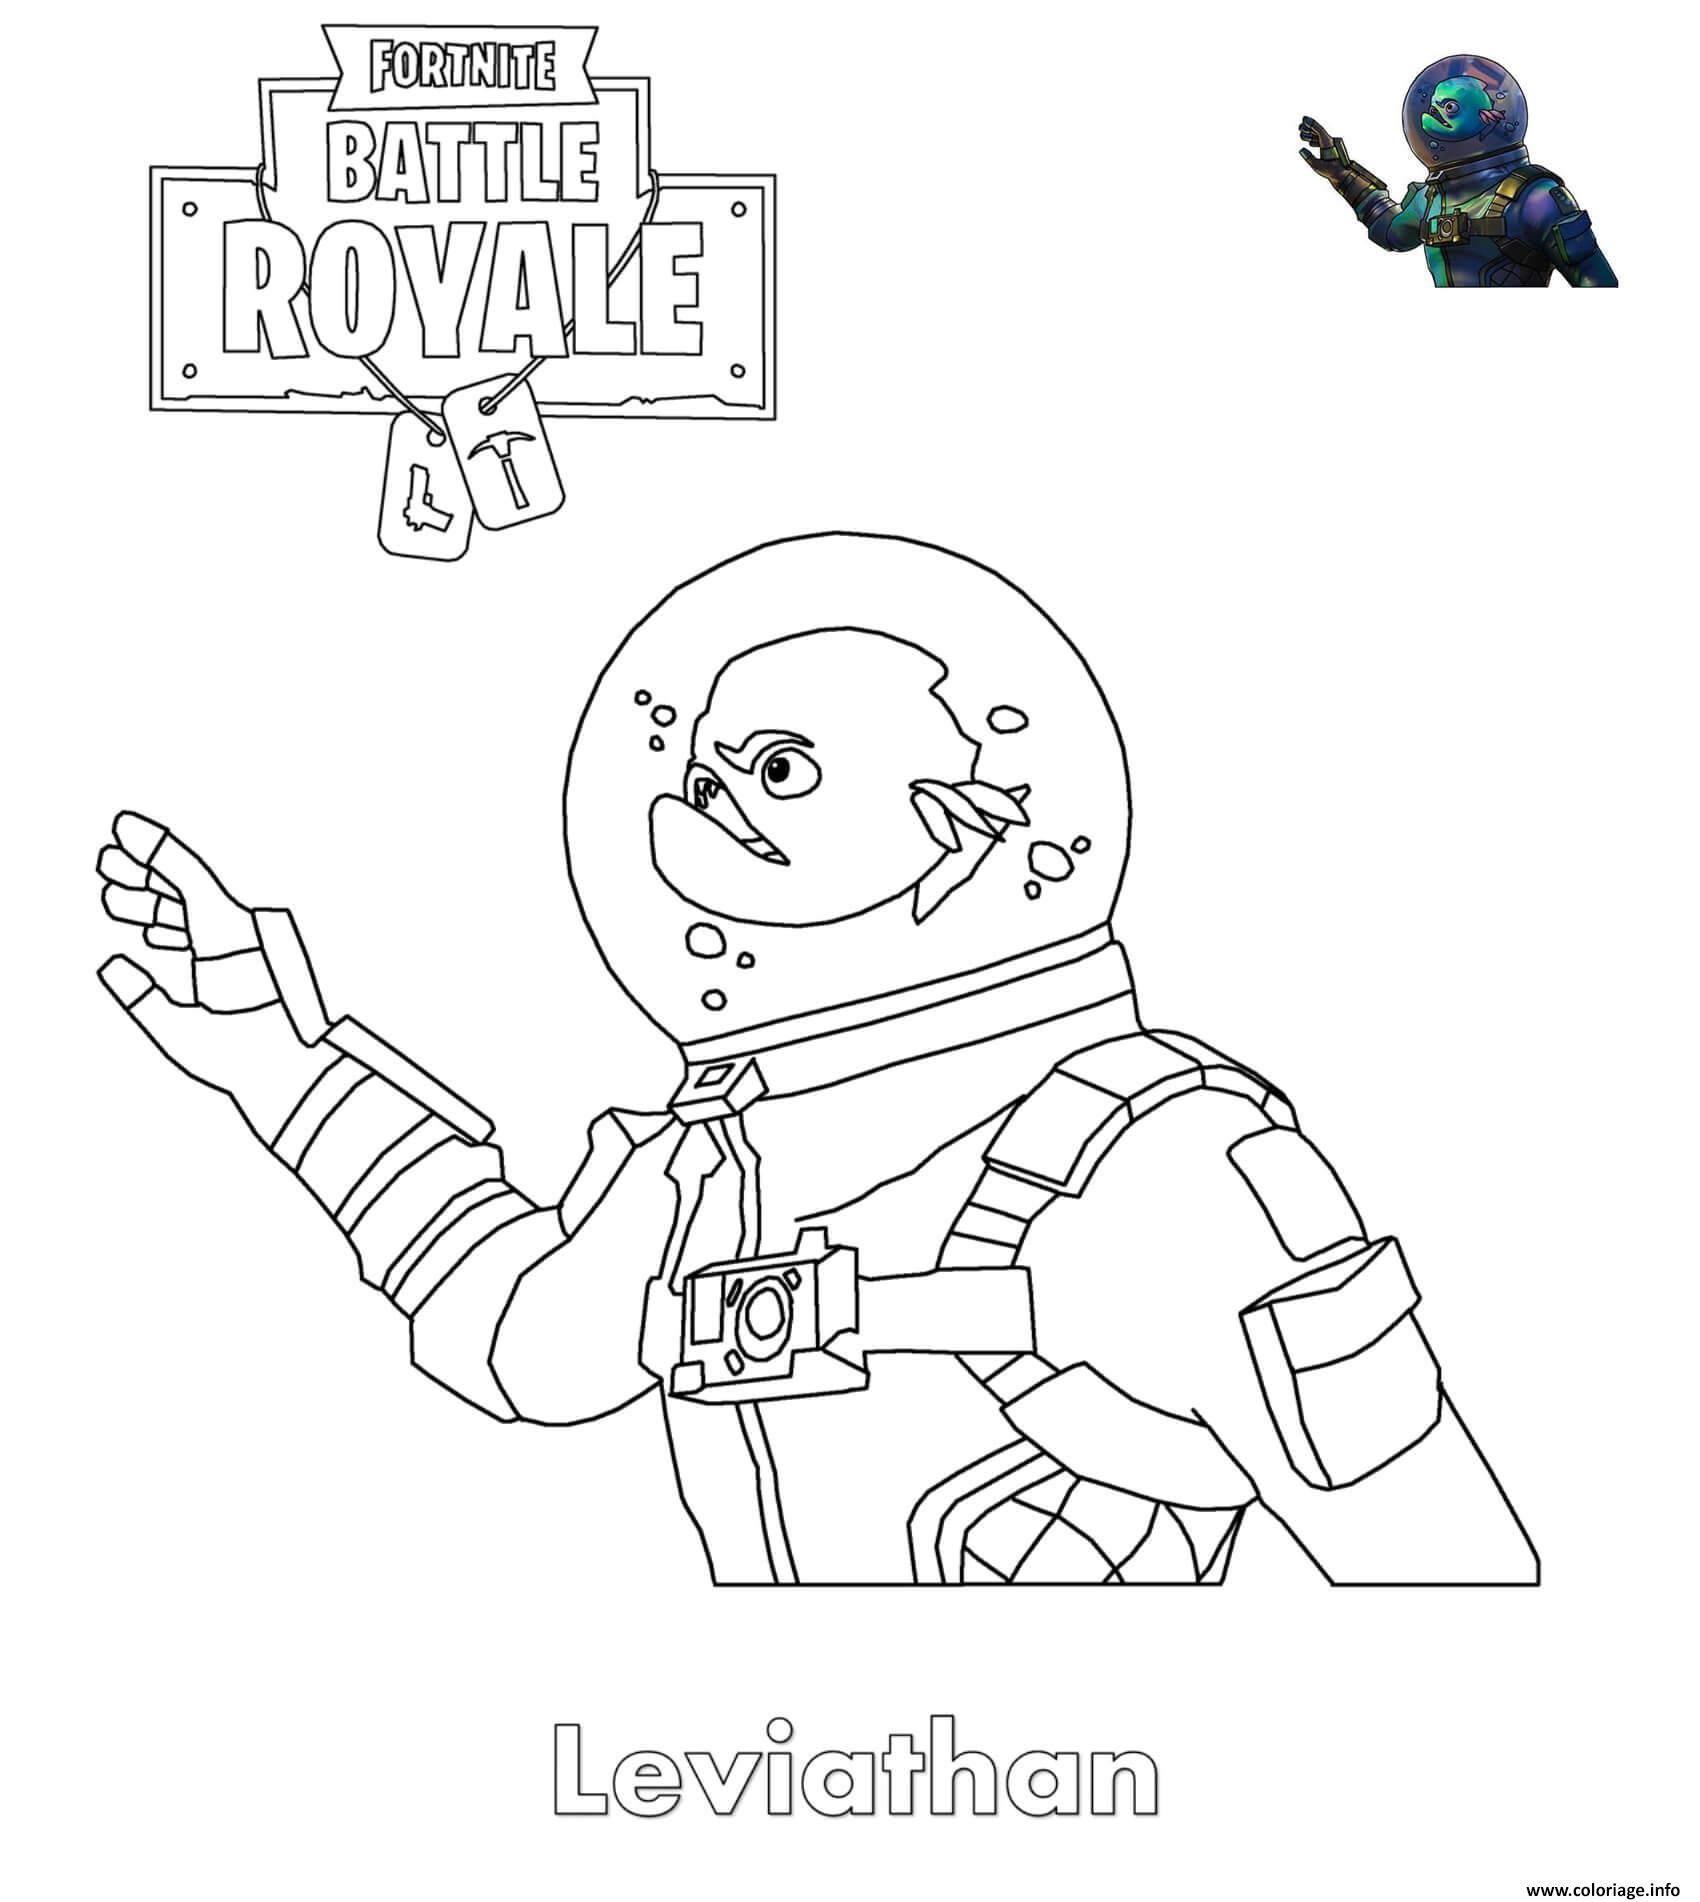 Coloriage Fortnite Leviathan Skin À Imprimer | Coloriage à Coloriage A Imprimer Fortnite